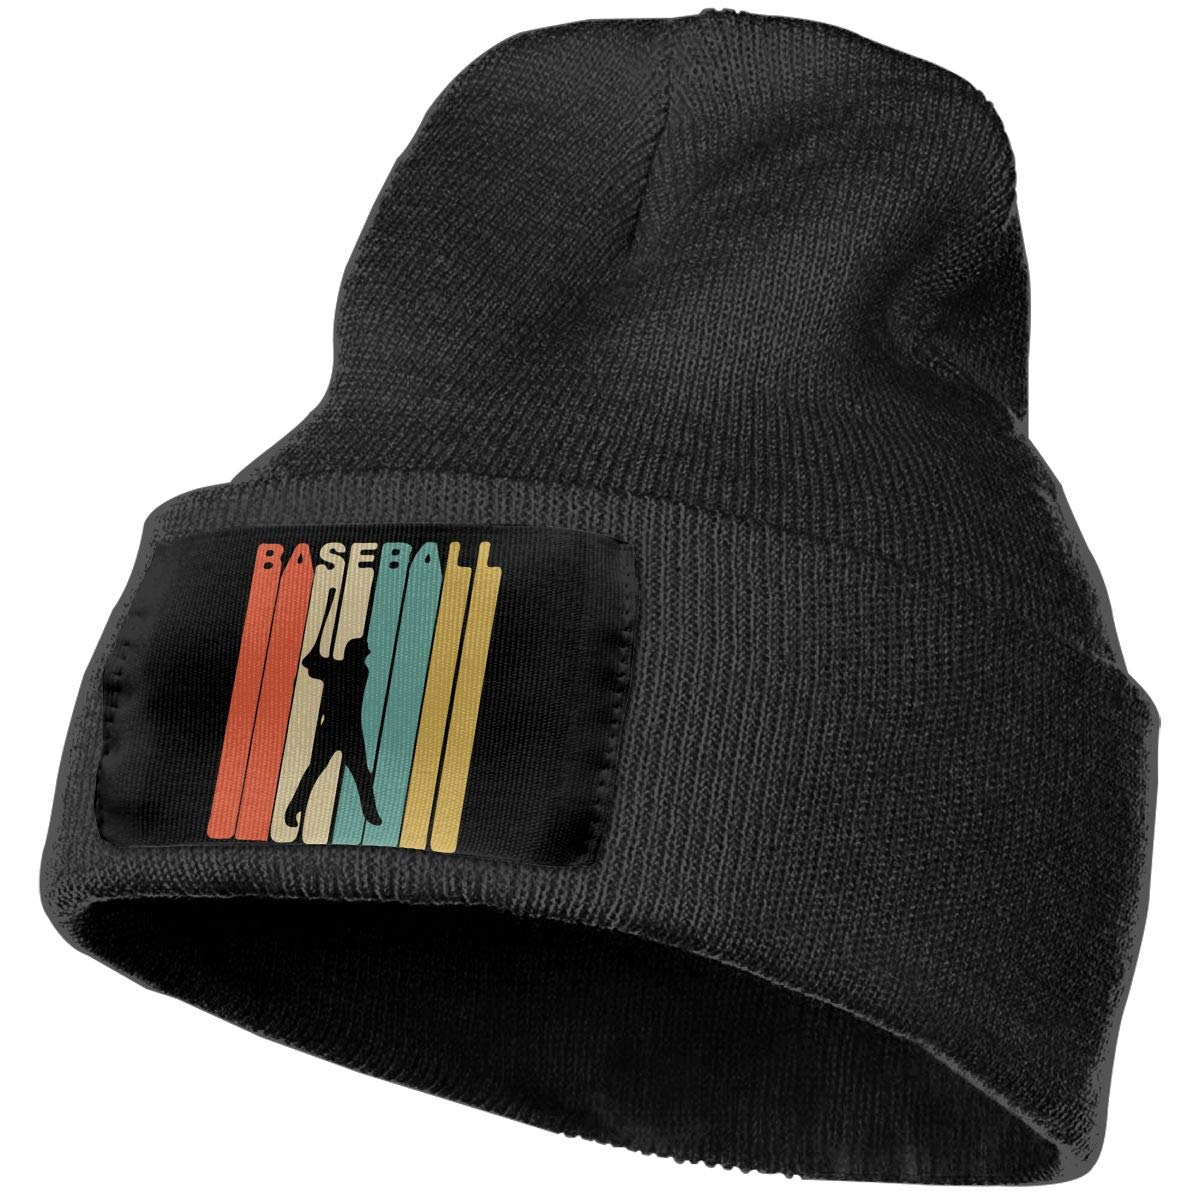 Retro Style Baseball Player Men /& Women Knit Hats Stretchy /& Soft Skull Cap Beanie